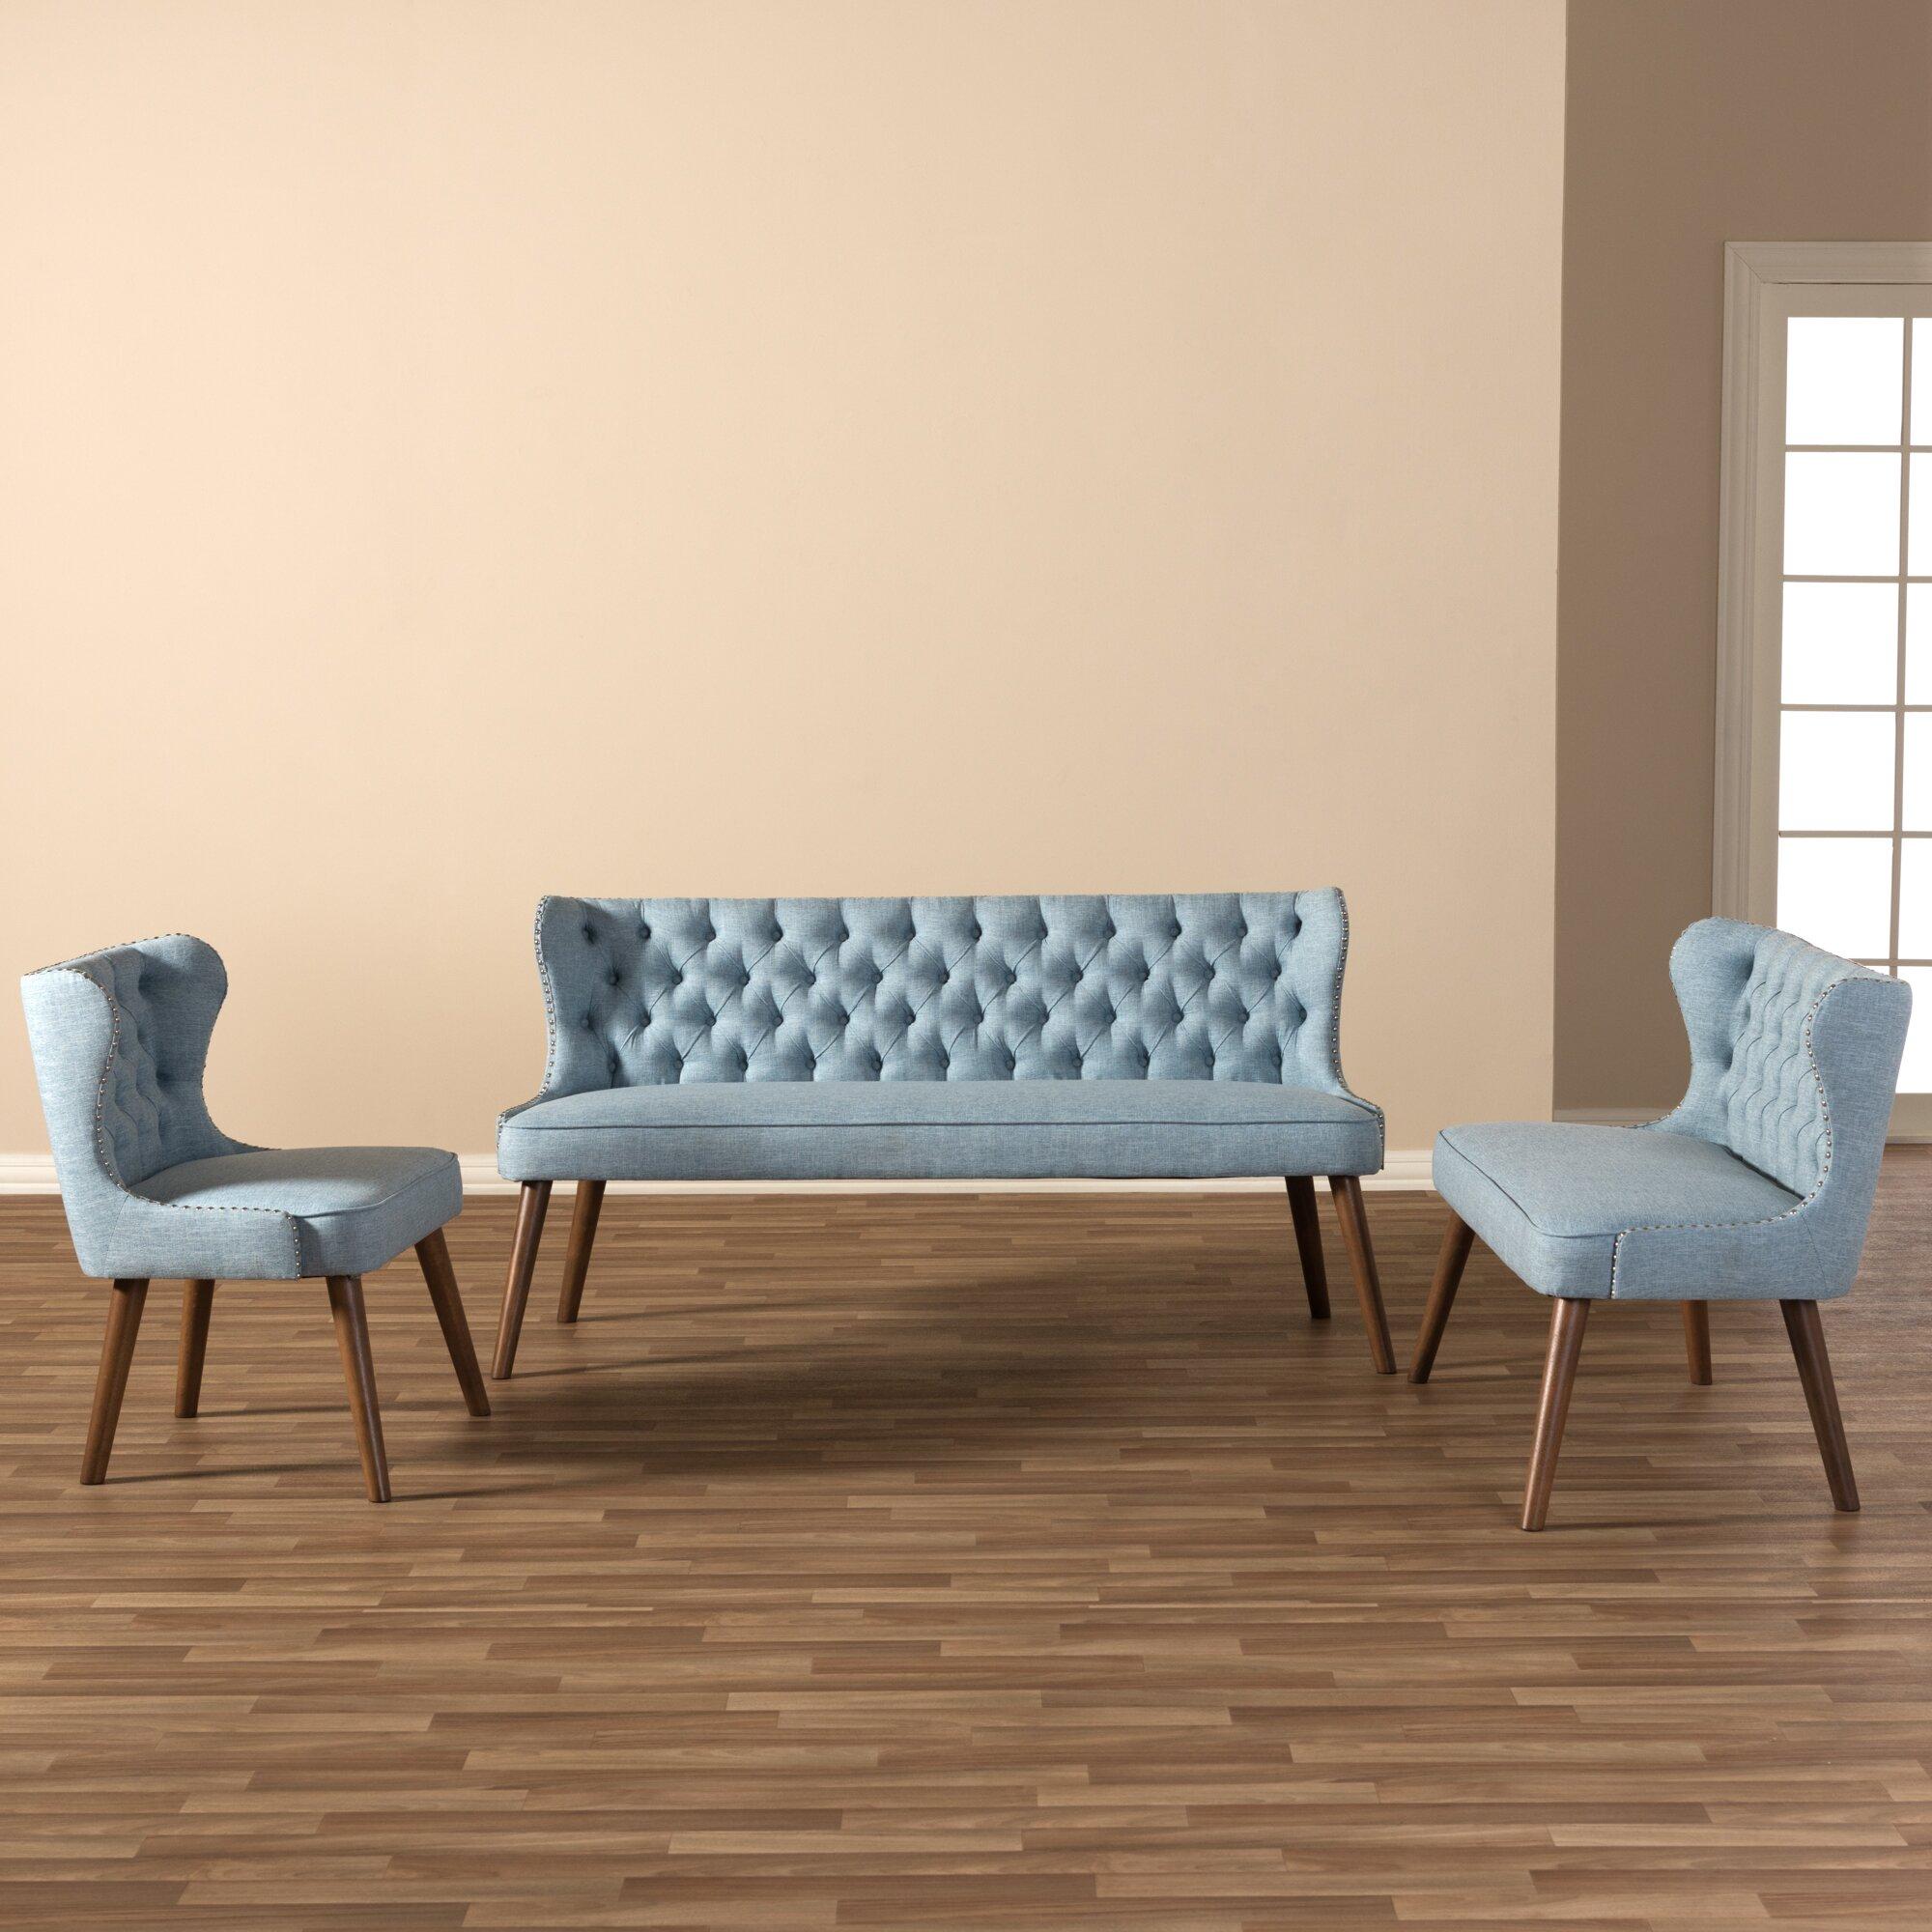 Wholesale interiors baxton studio 3 piece living room set for 3 piece living room set